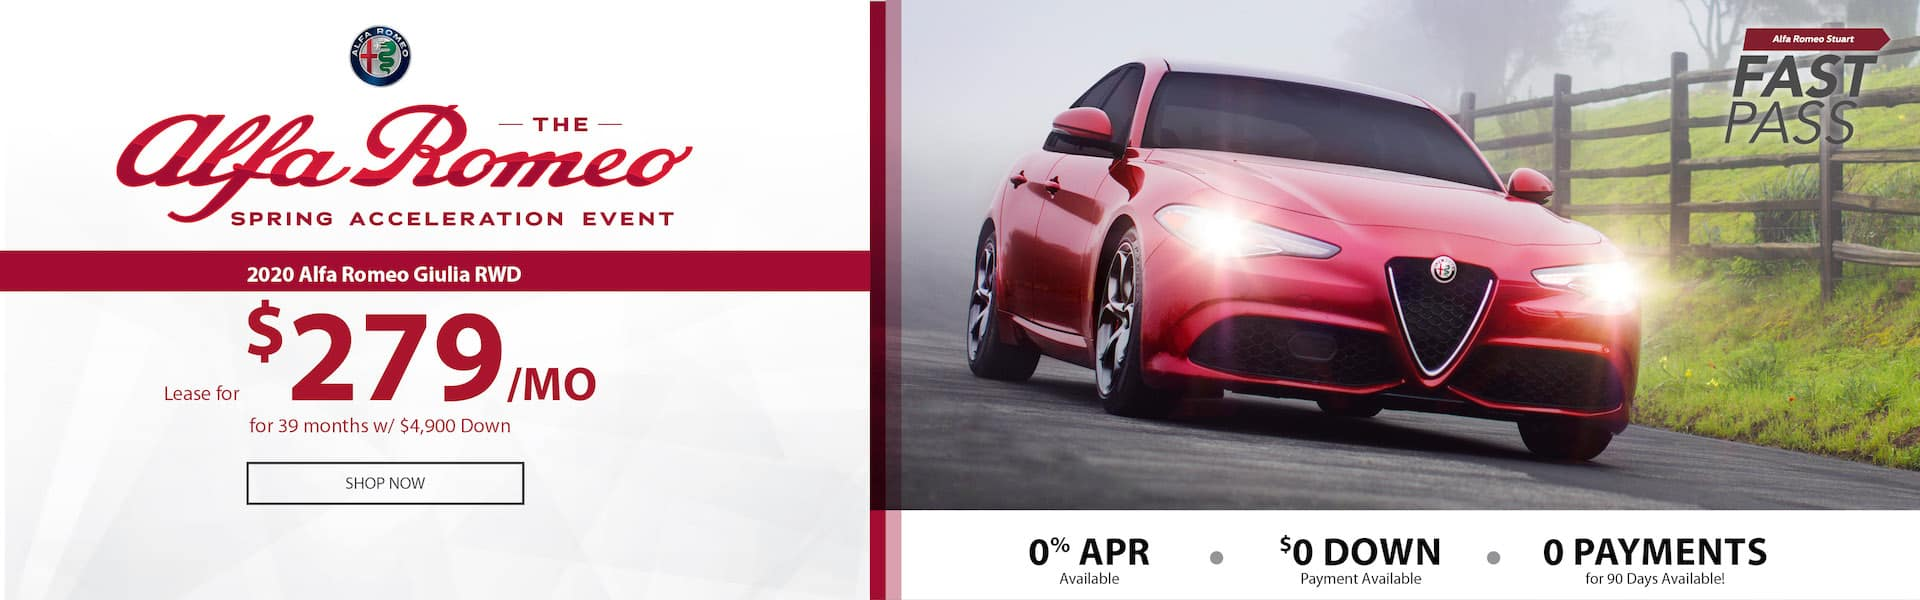 Alfa Romeo Spring Acceleration Event